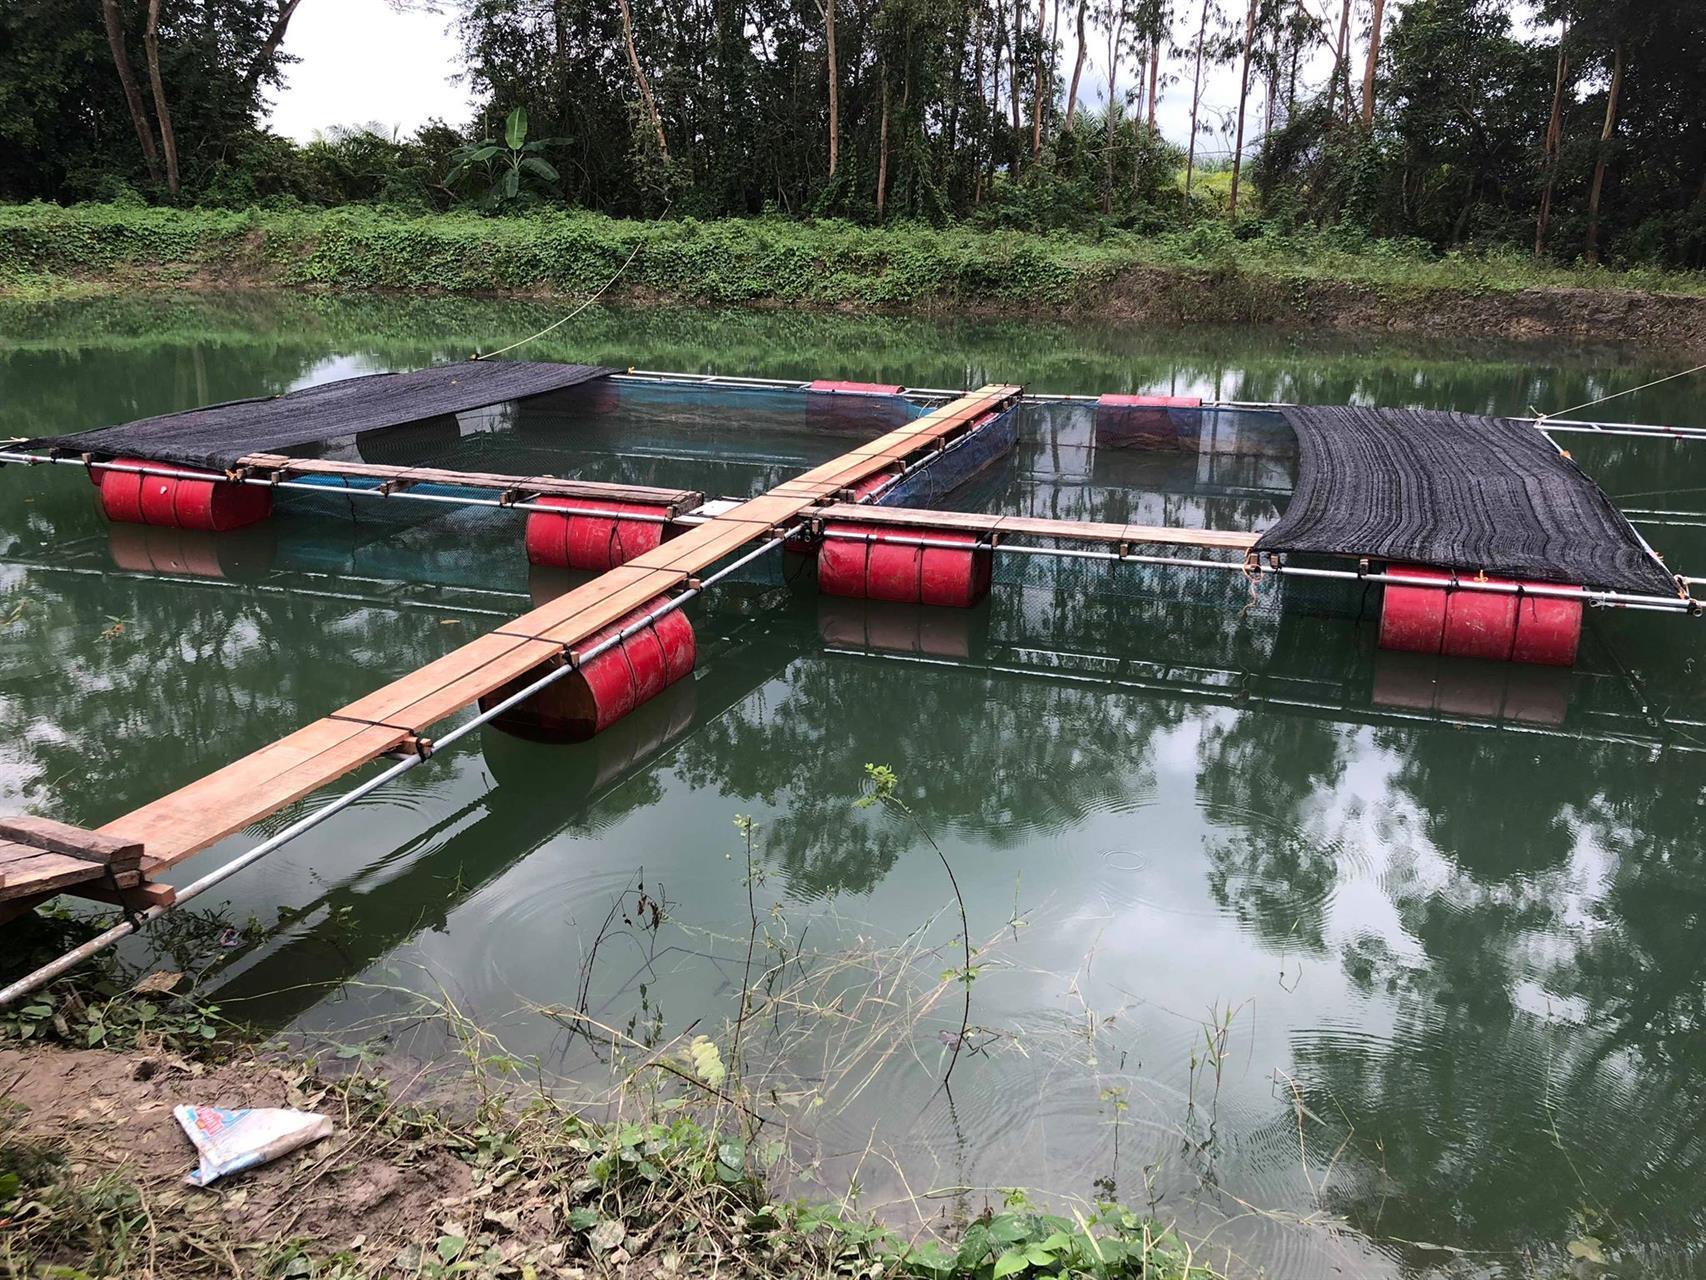 Fiskeoppdrett.